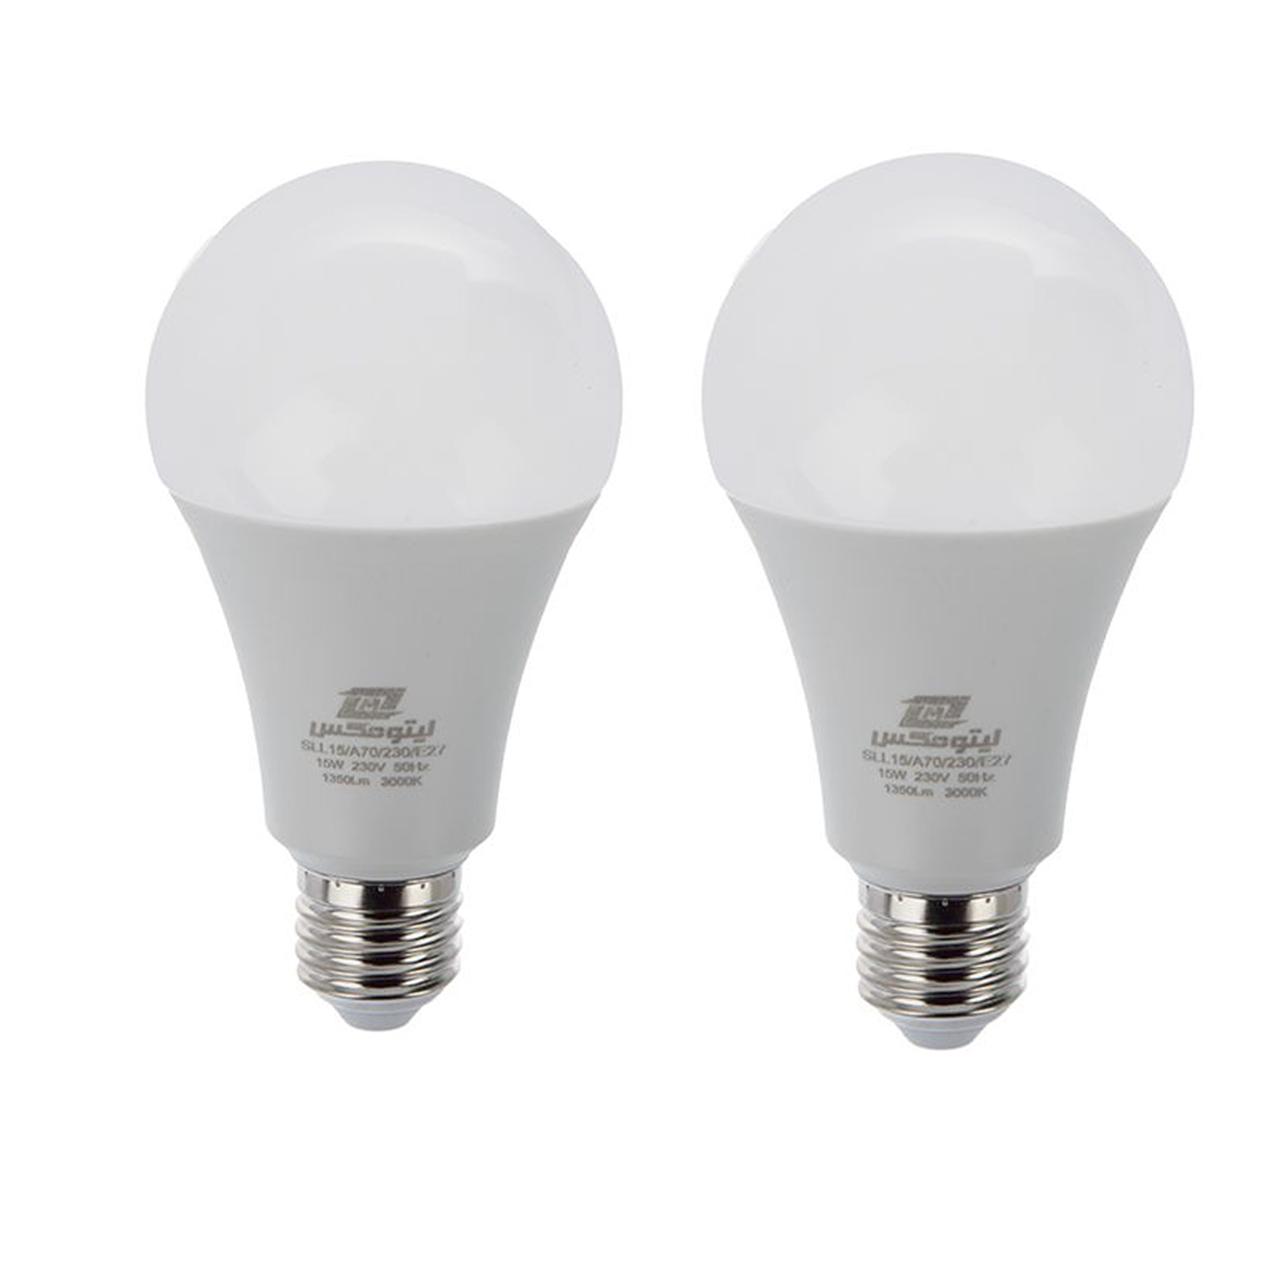 لامپ ال ای دی 15 وات لیتومکس کد 001 پایه E27 بسته 2 عددی